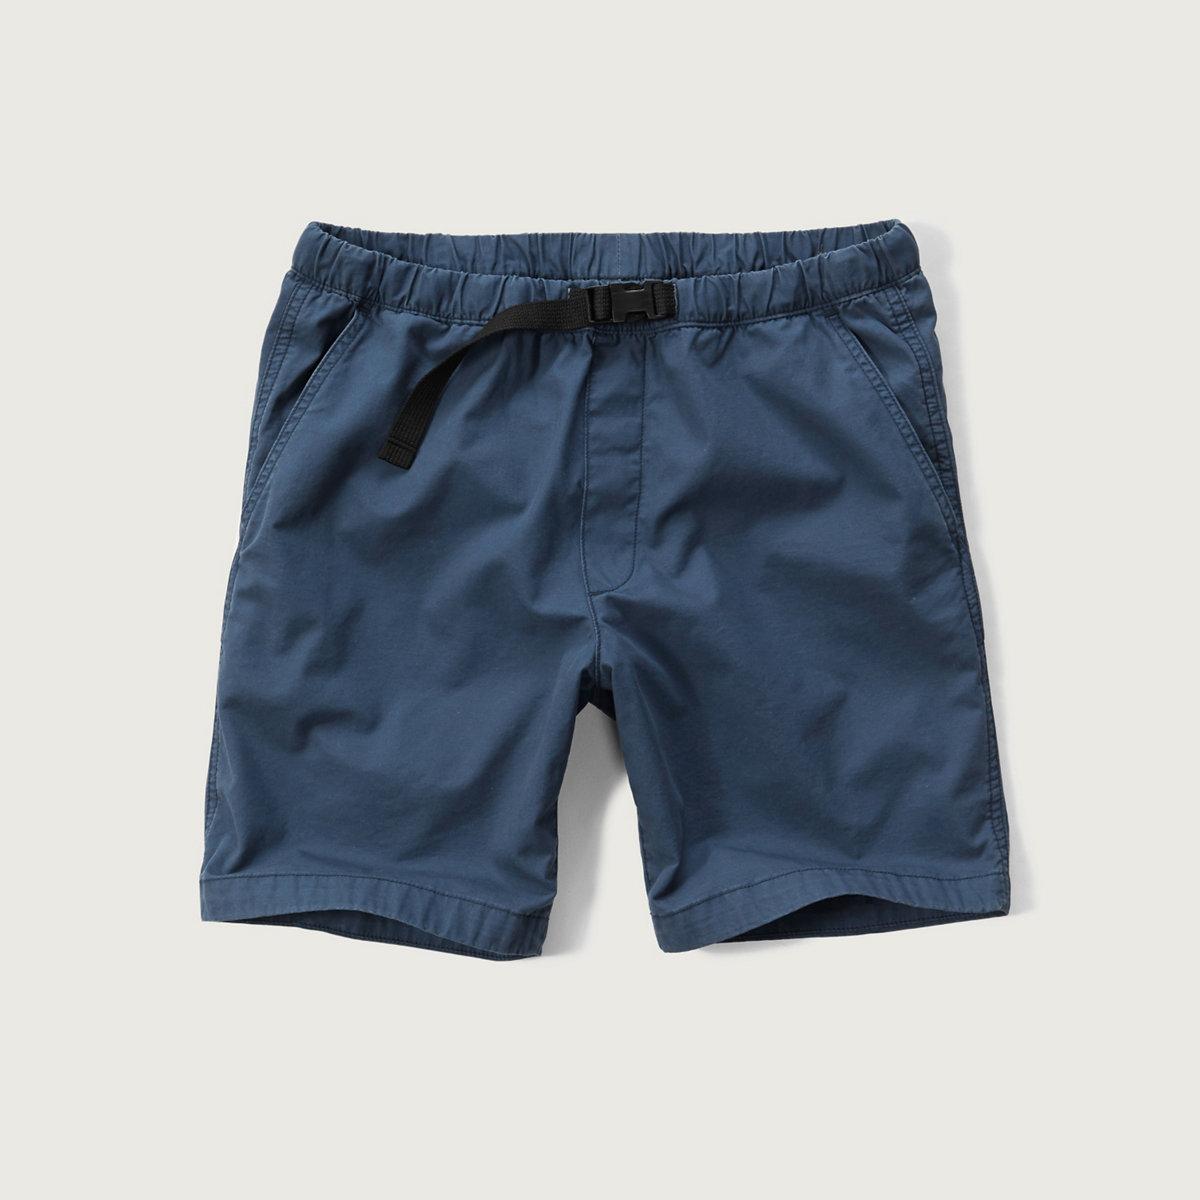 Surveyor Shorts